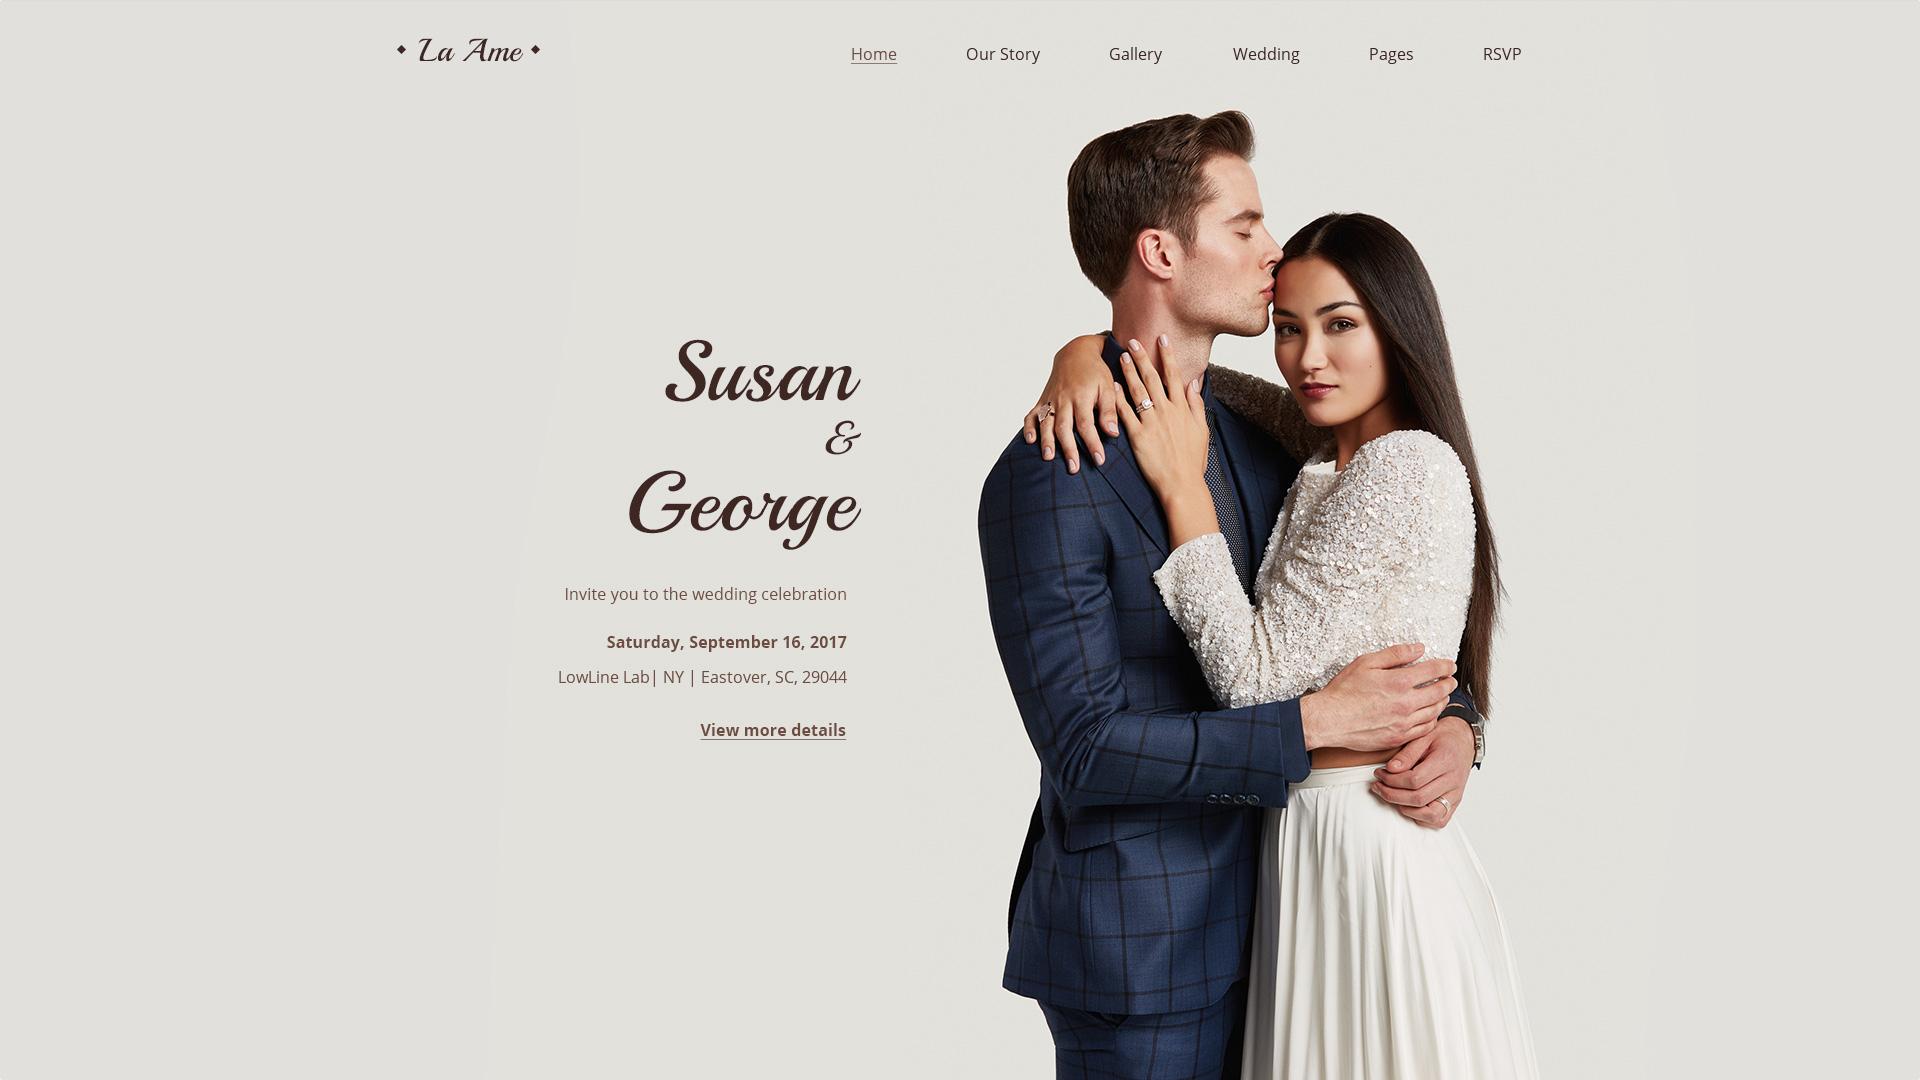 La Ame — Elegant Wedding PSD Template by torbara | ThemeForest